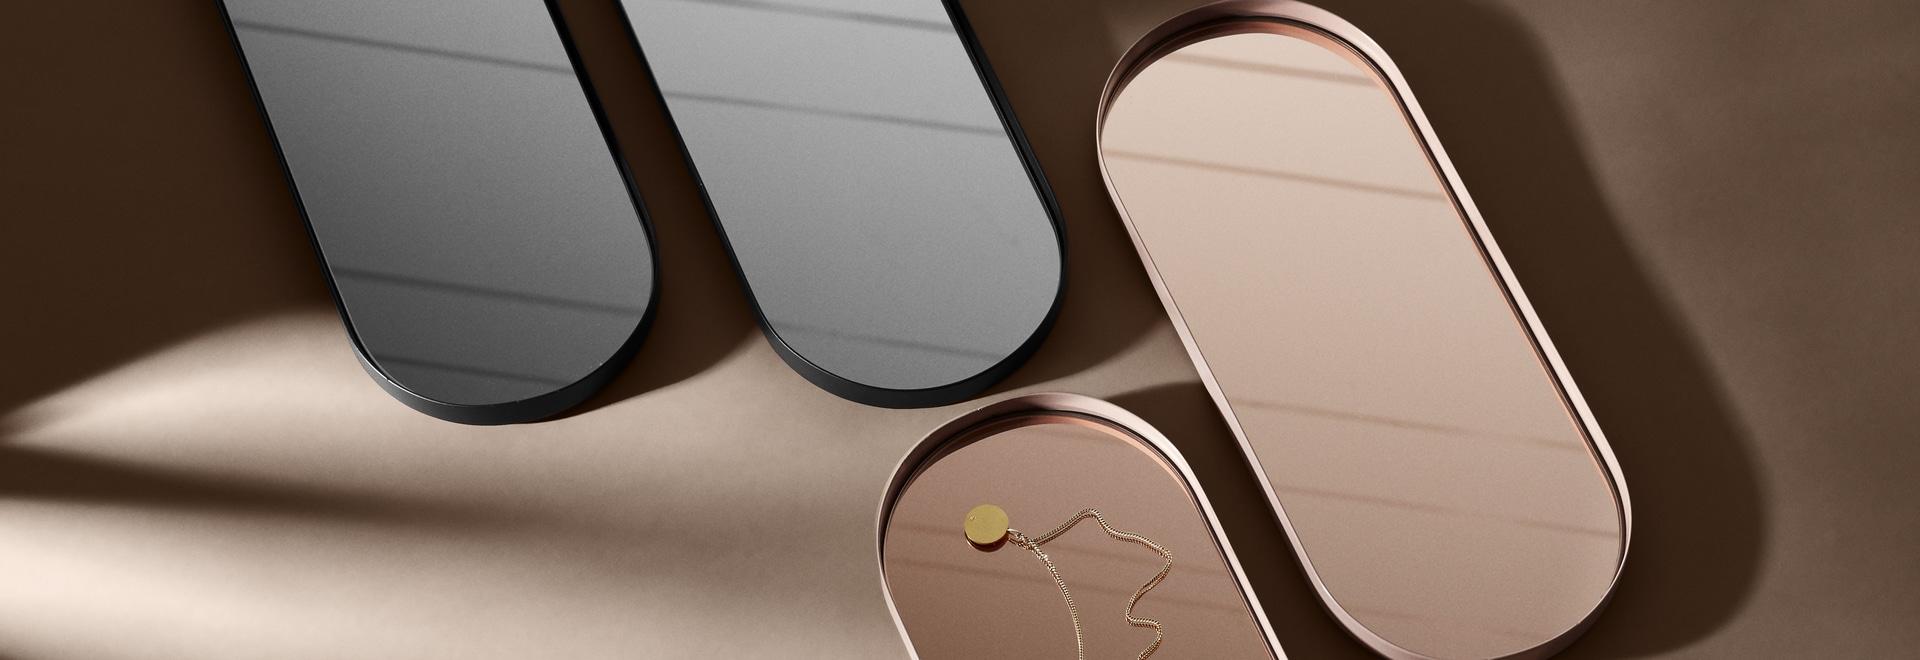 Mirror trays